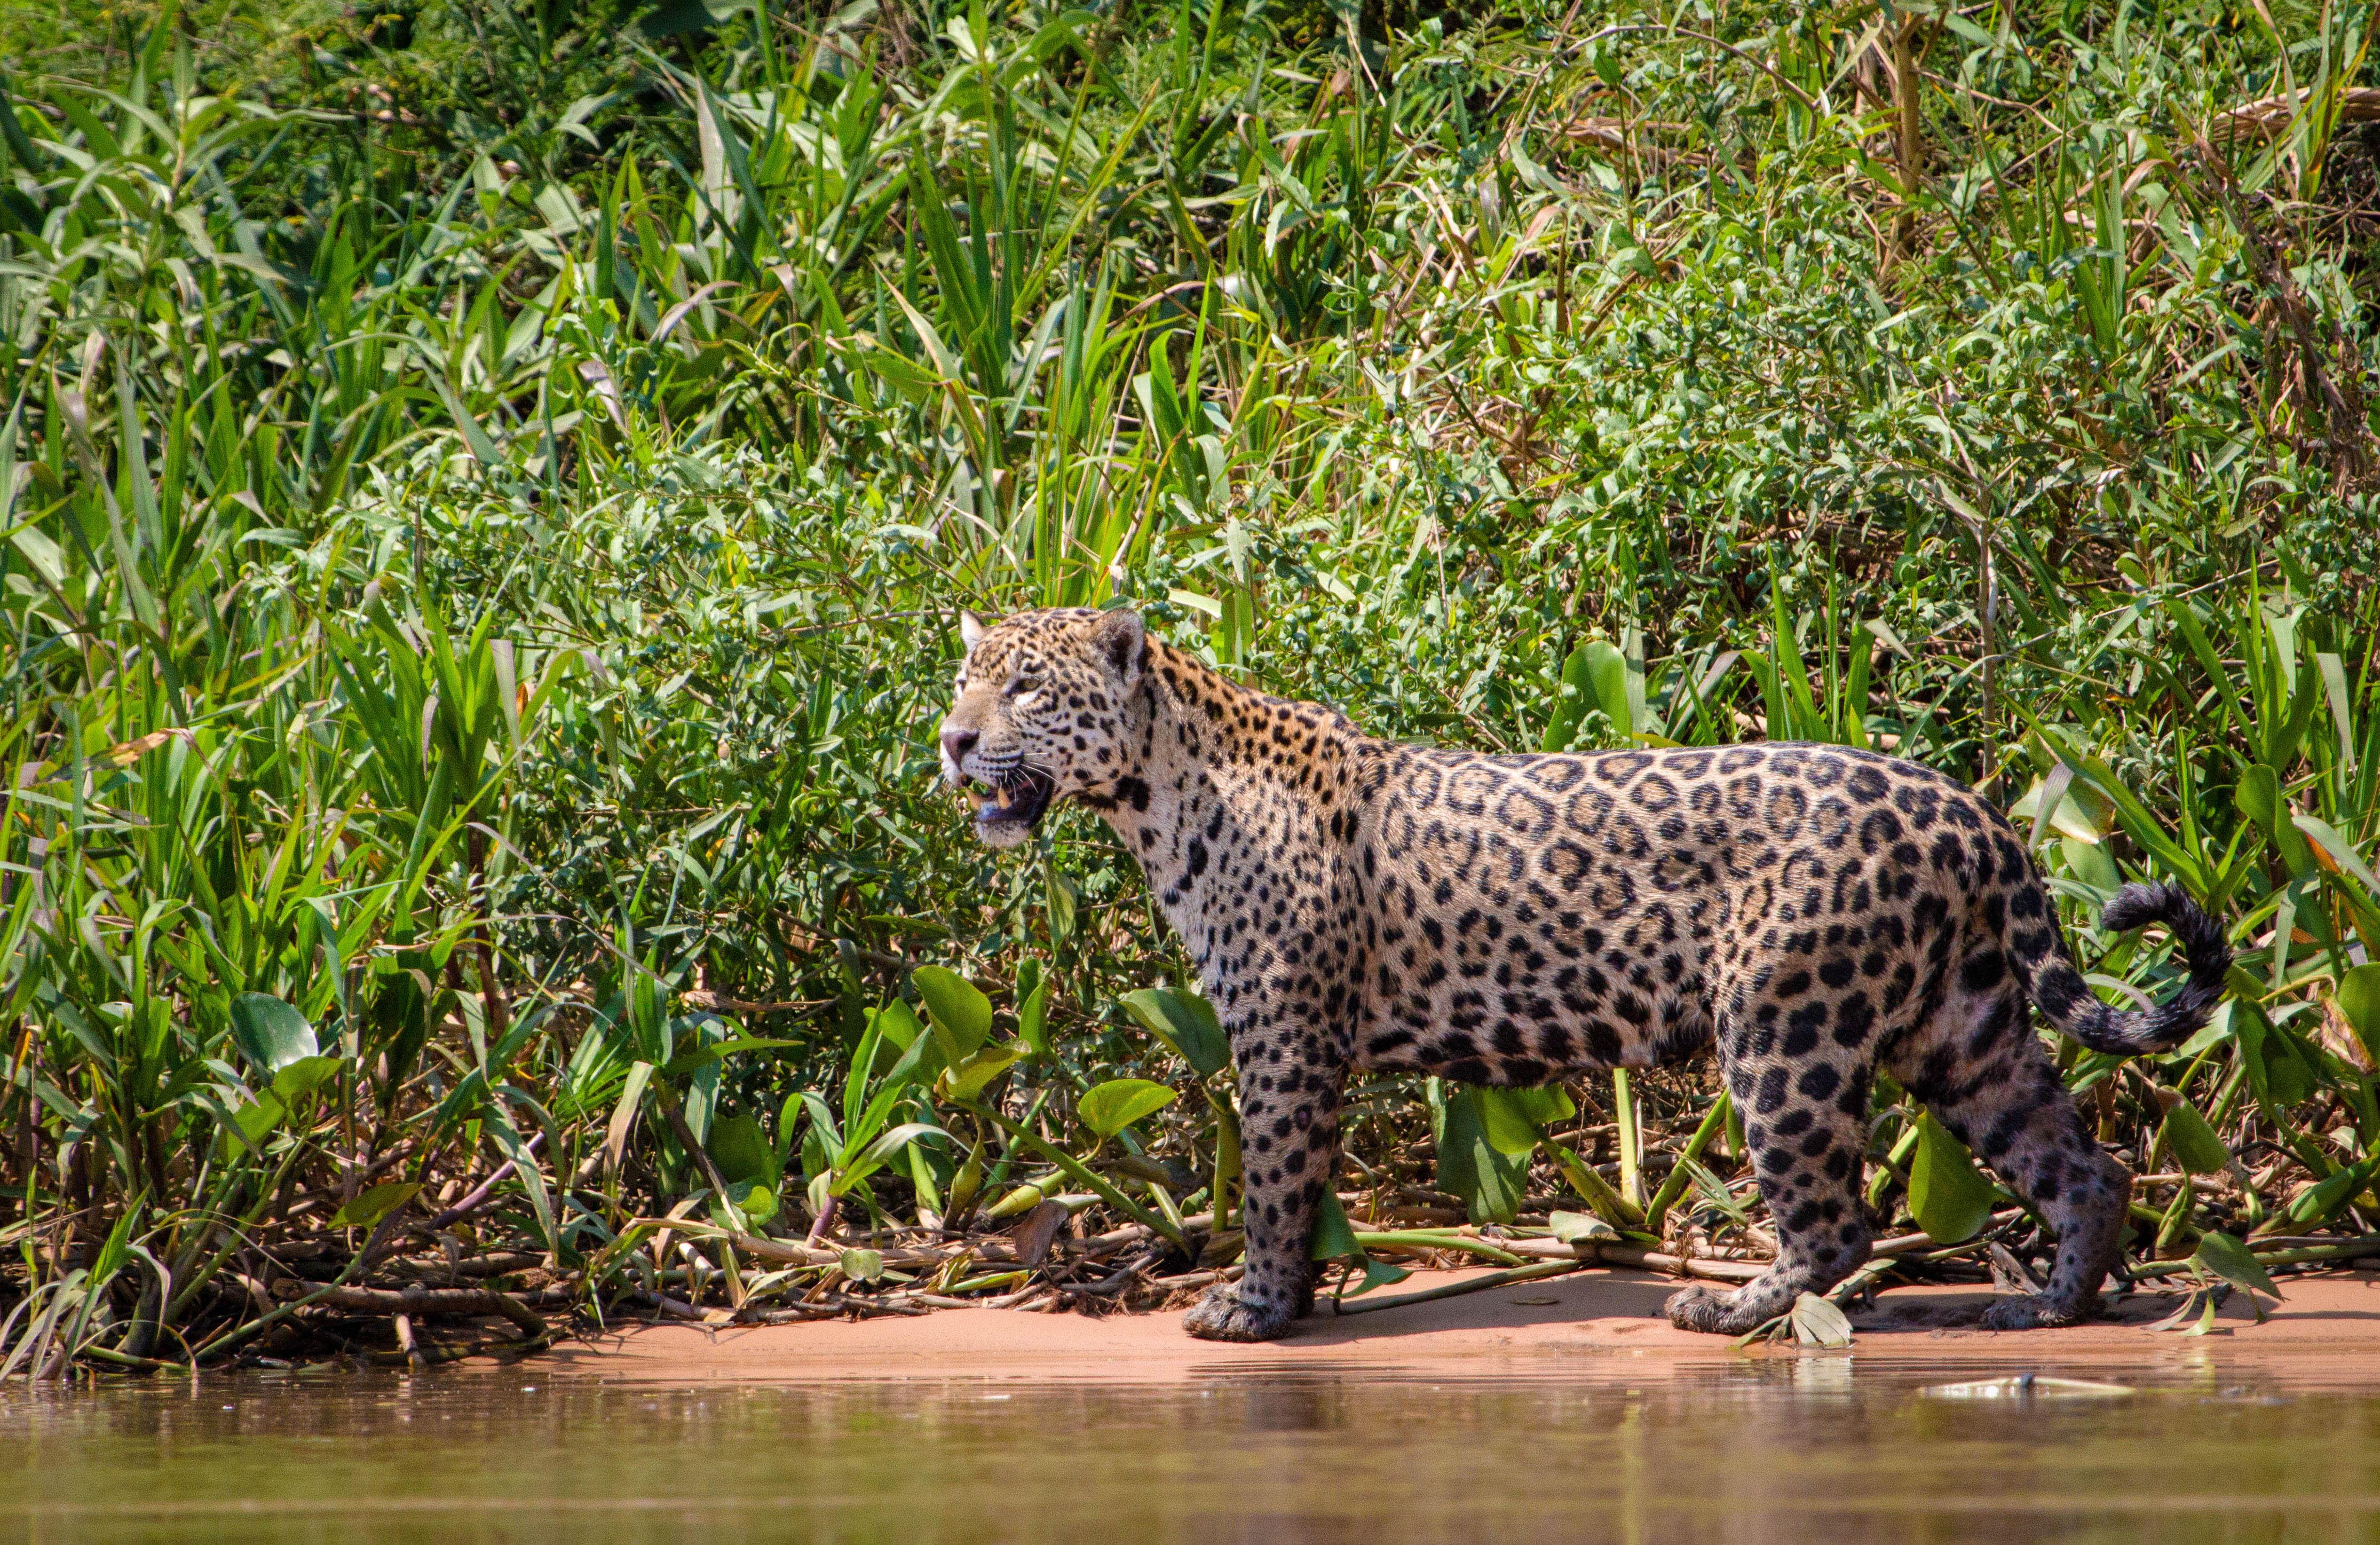 Jaguar standing on a river bank